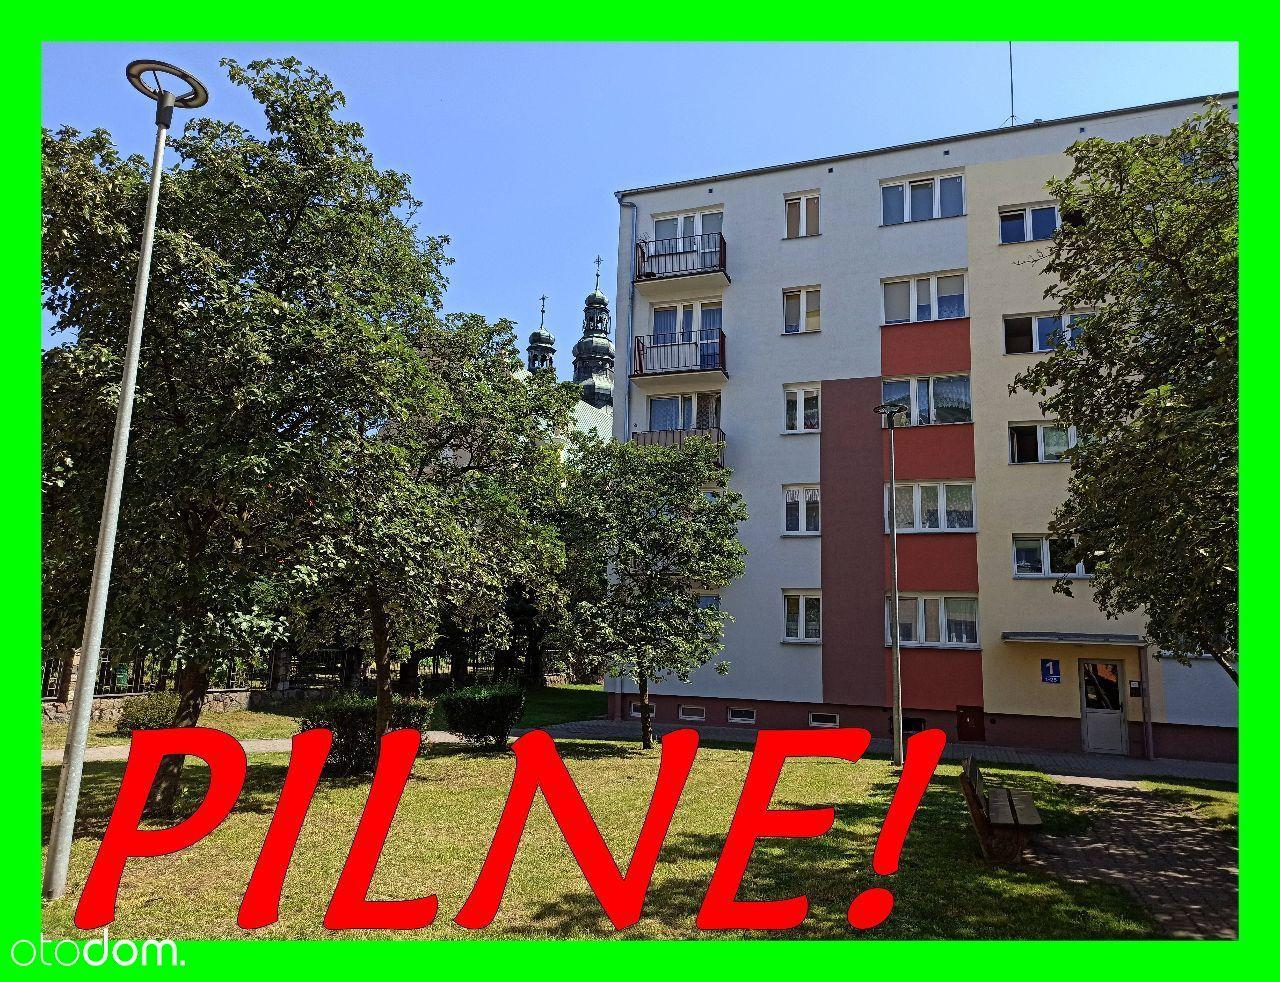 PILNE! 47,9 m2, 3 pokoje, blok, PARTER!!! Okazja!!